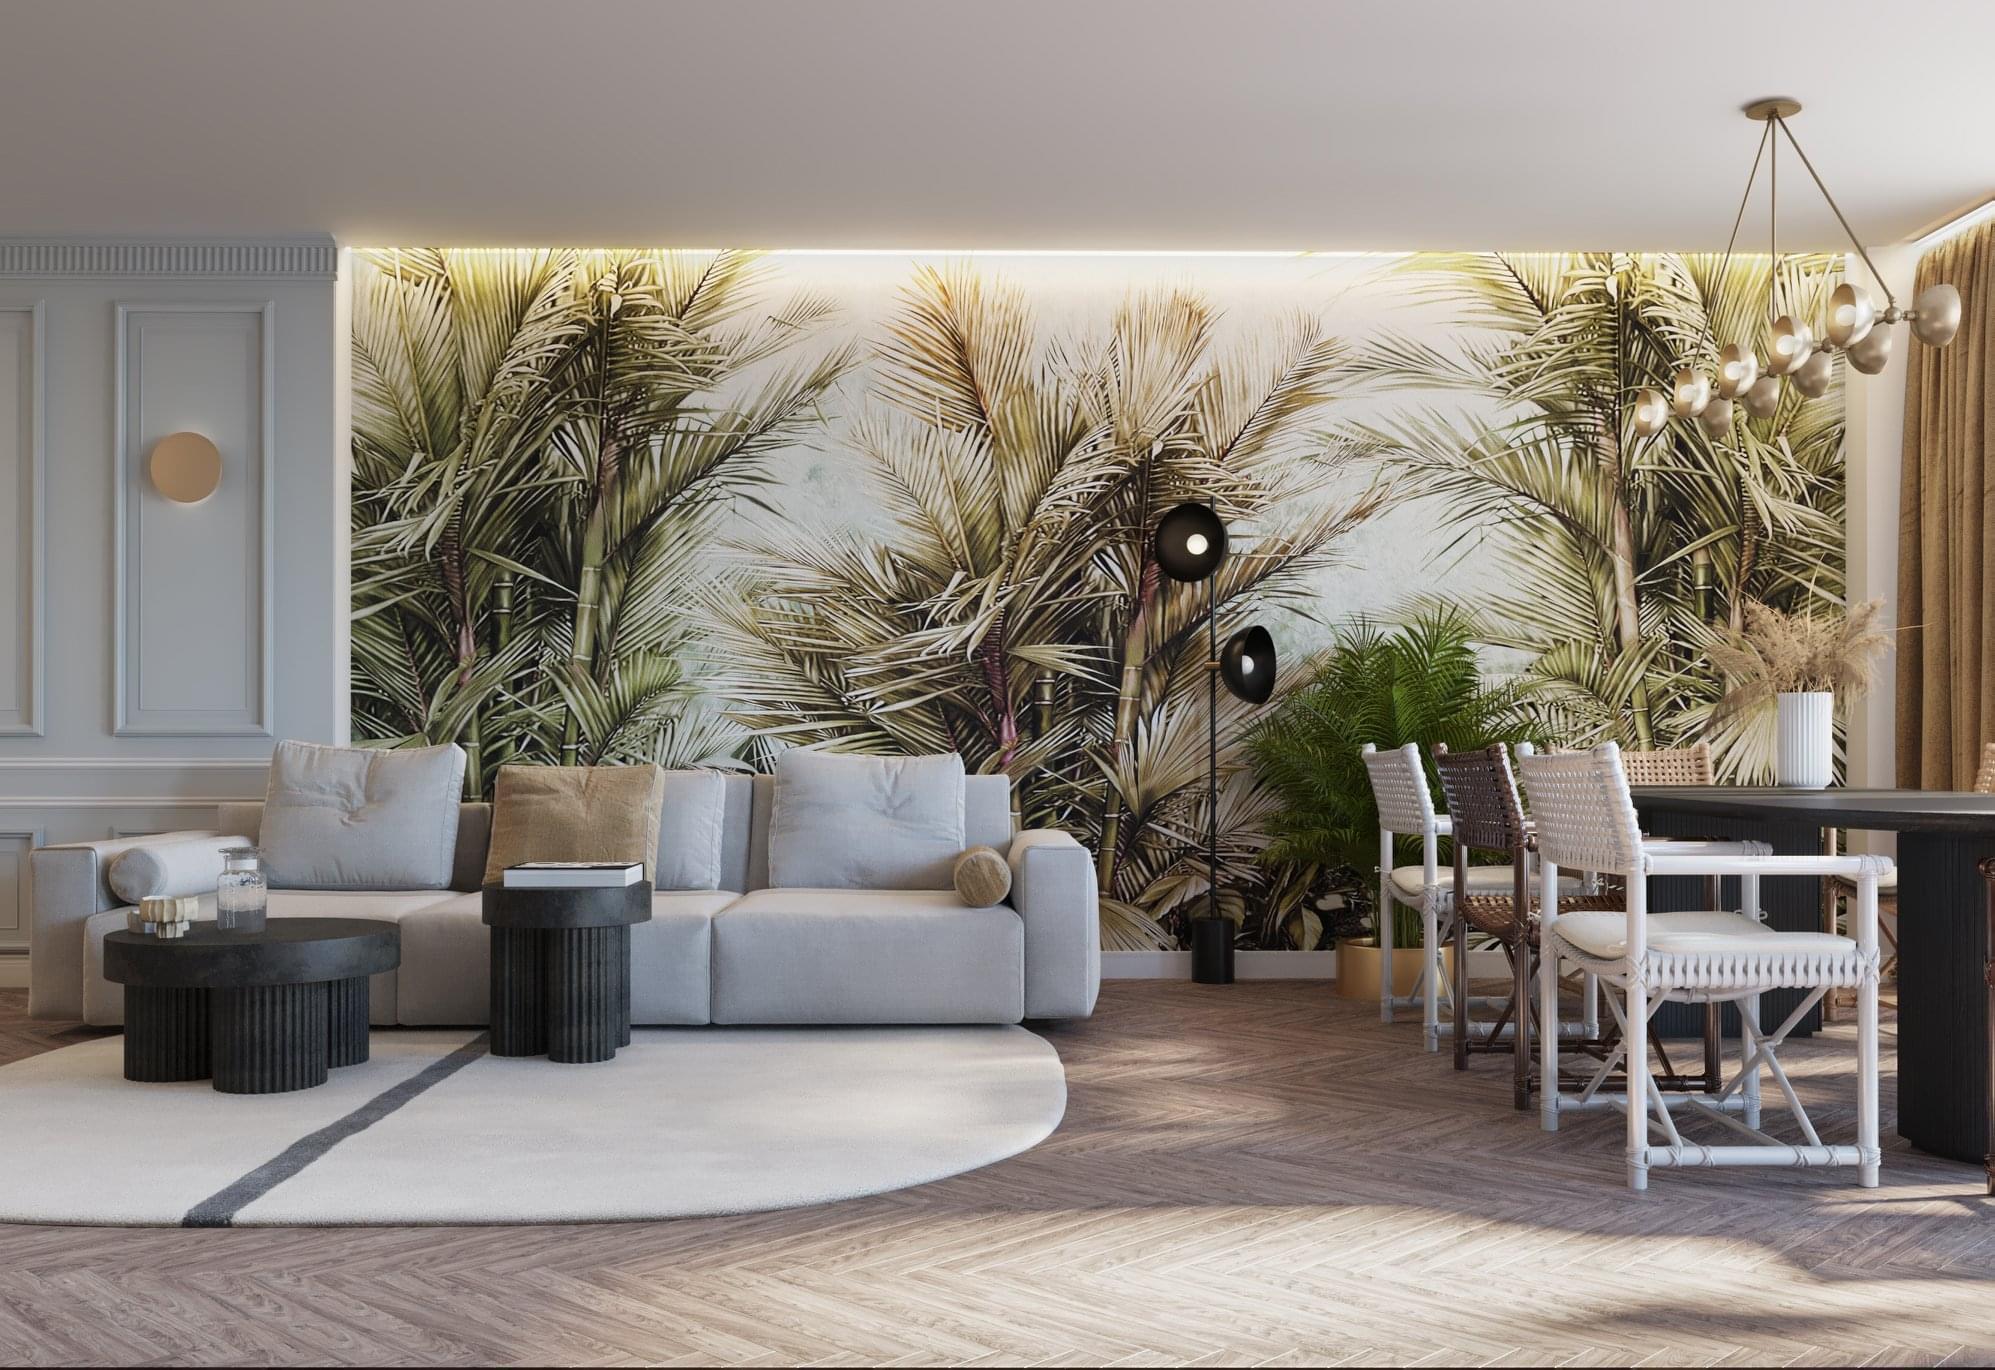 Alexandra Crisan Studio